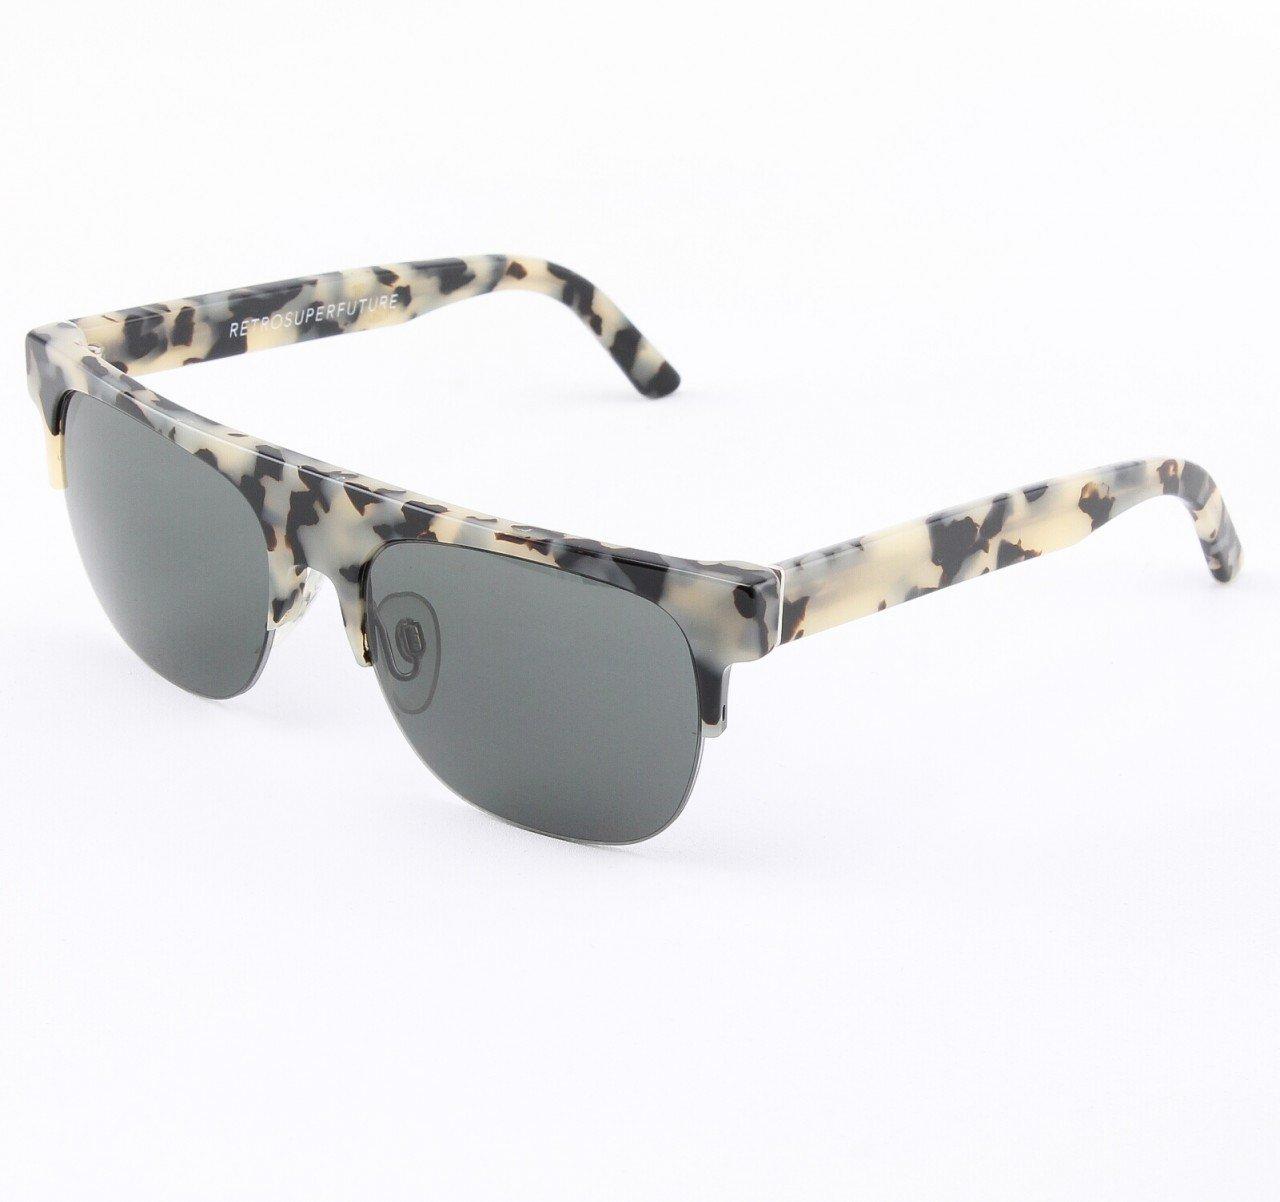 Super Andrea 266/2 Sunglasses Puma Black with Grey Zeiss Lenses by RETROSUPERFUTURE